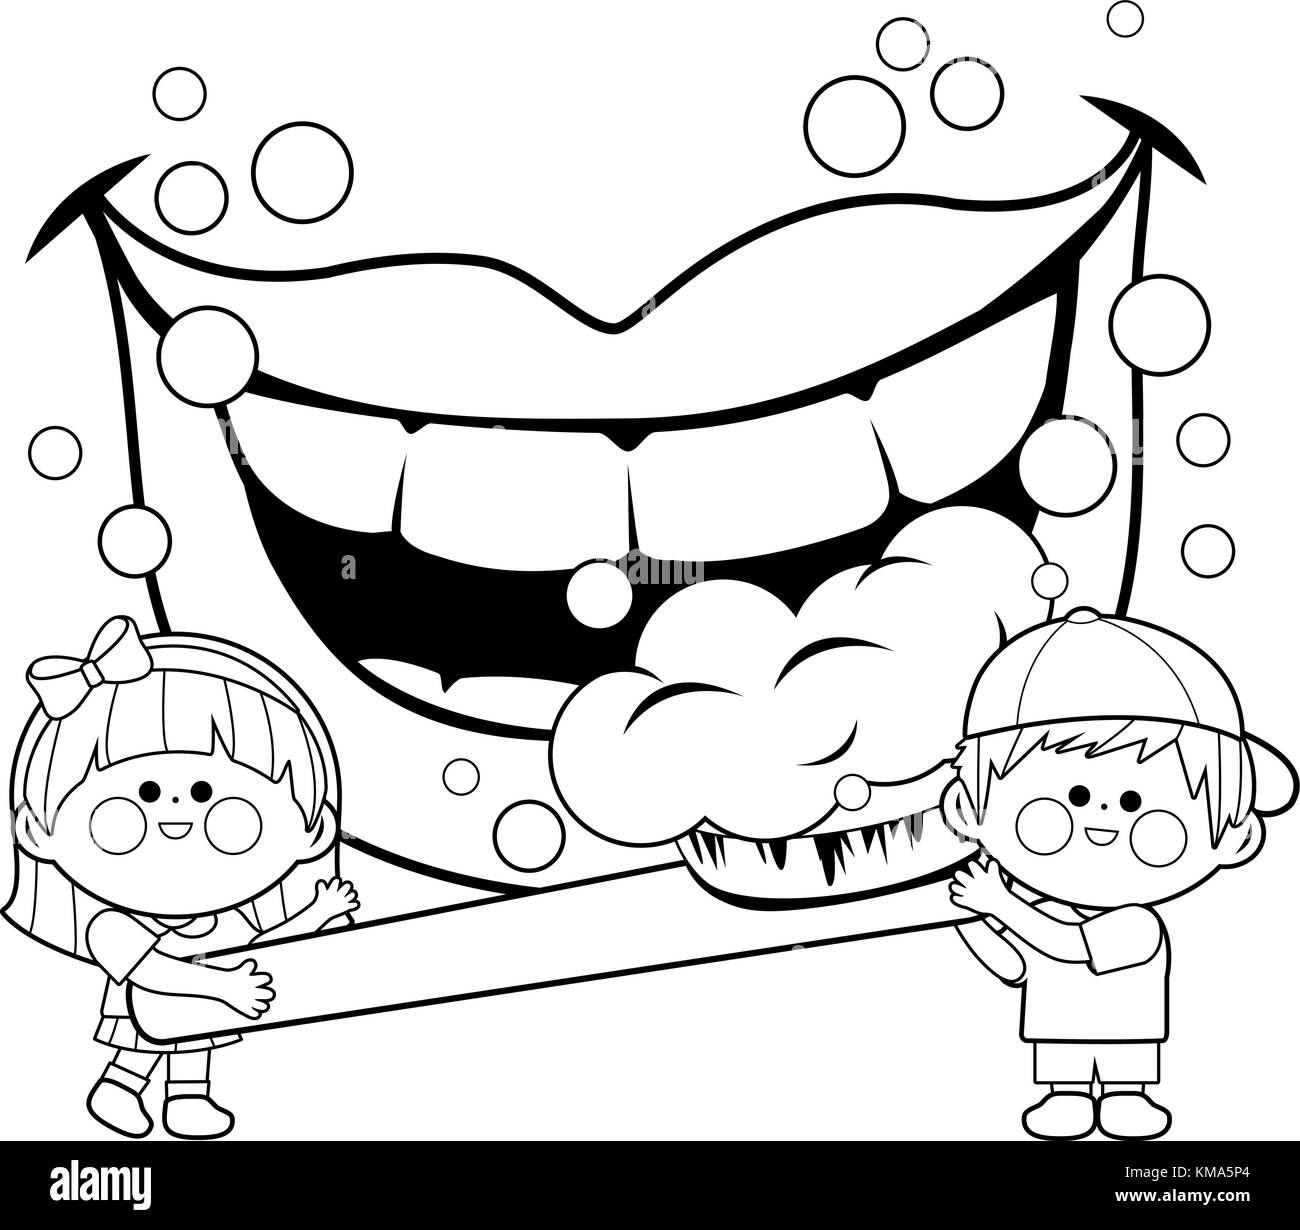 Brushing Teeth Black And White Stock Photos Amp Images